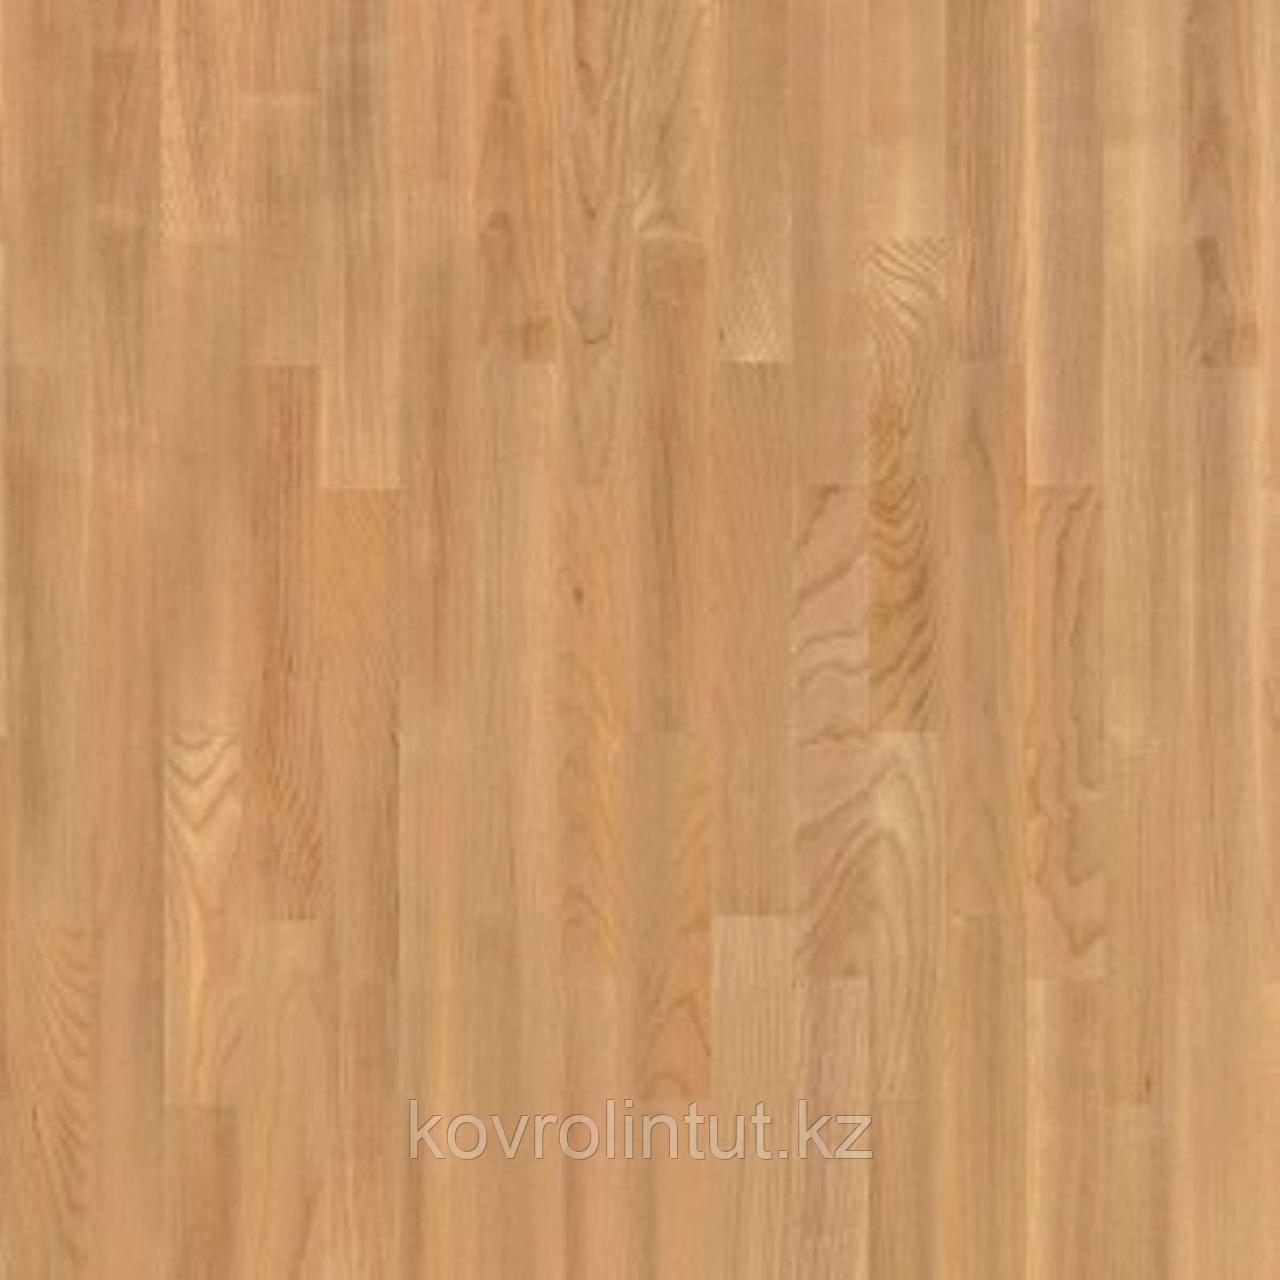 Паркет Tarkett Salsa Ясень сливочный 2283х194х14мм (6шт/2.658 м2)